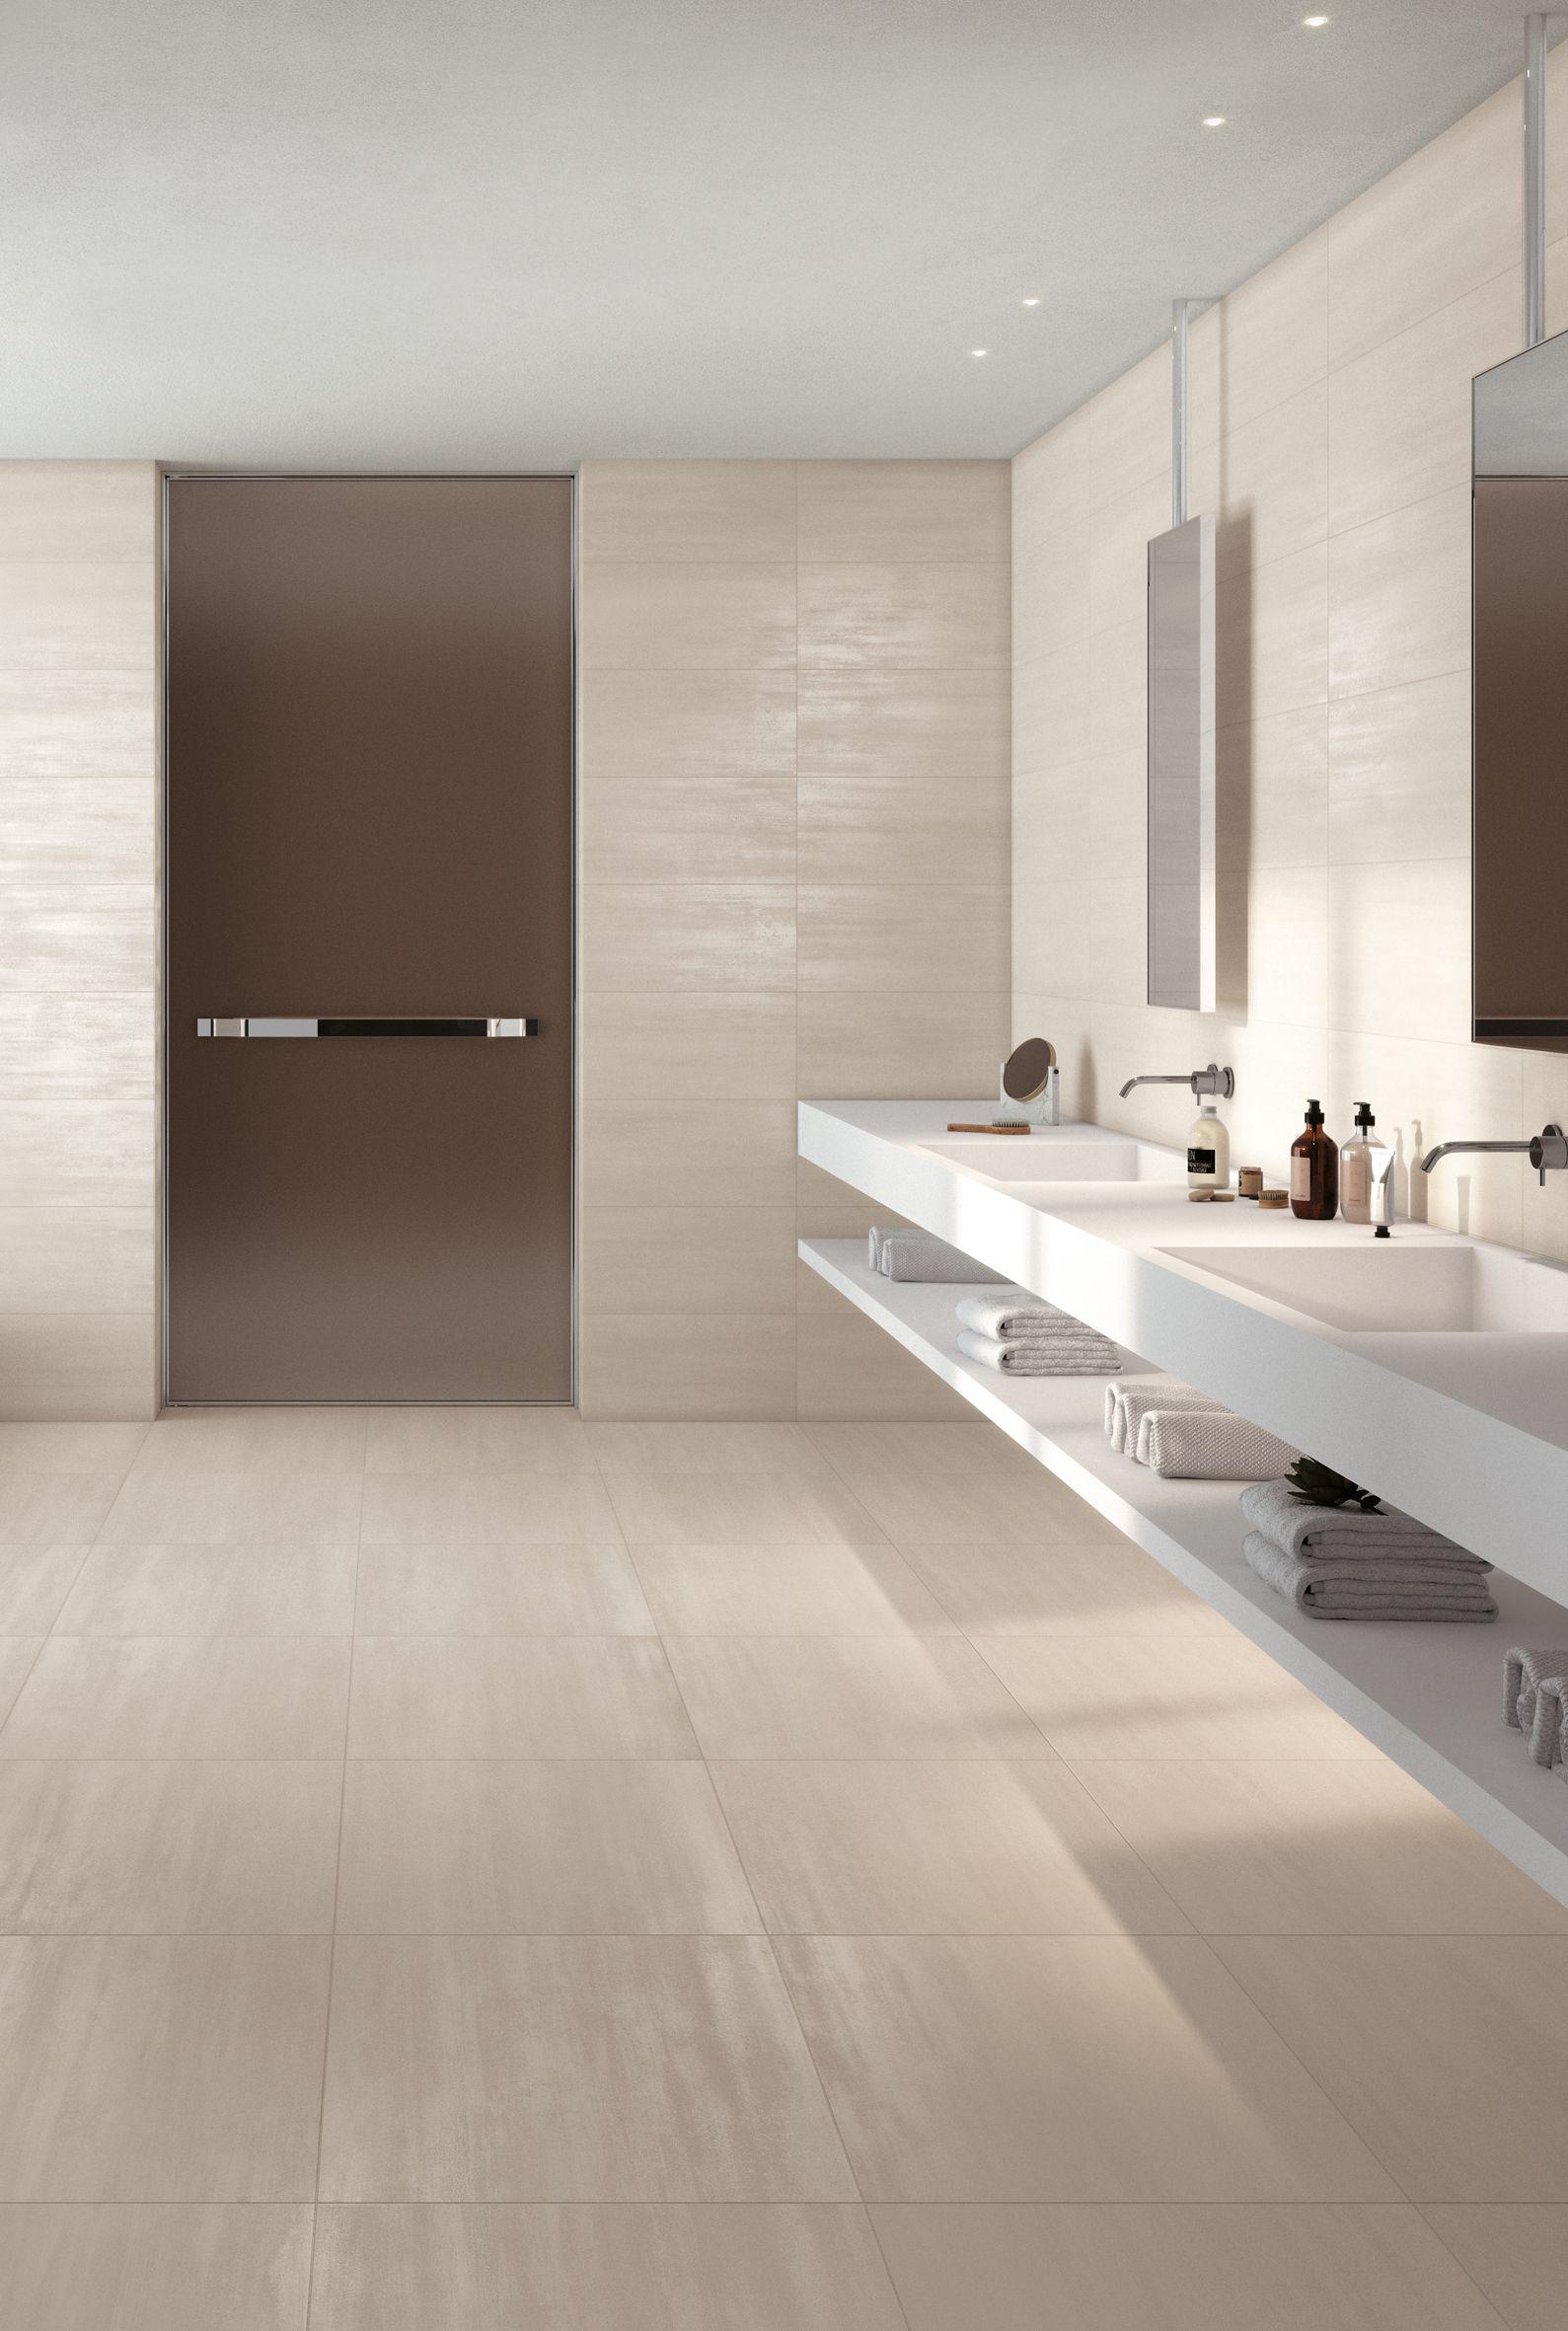 Salle De Bain Dax dax   bathroom, bathroom lighting, mirror